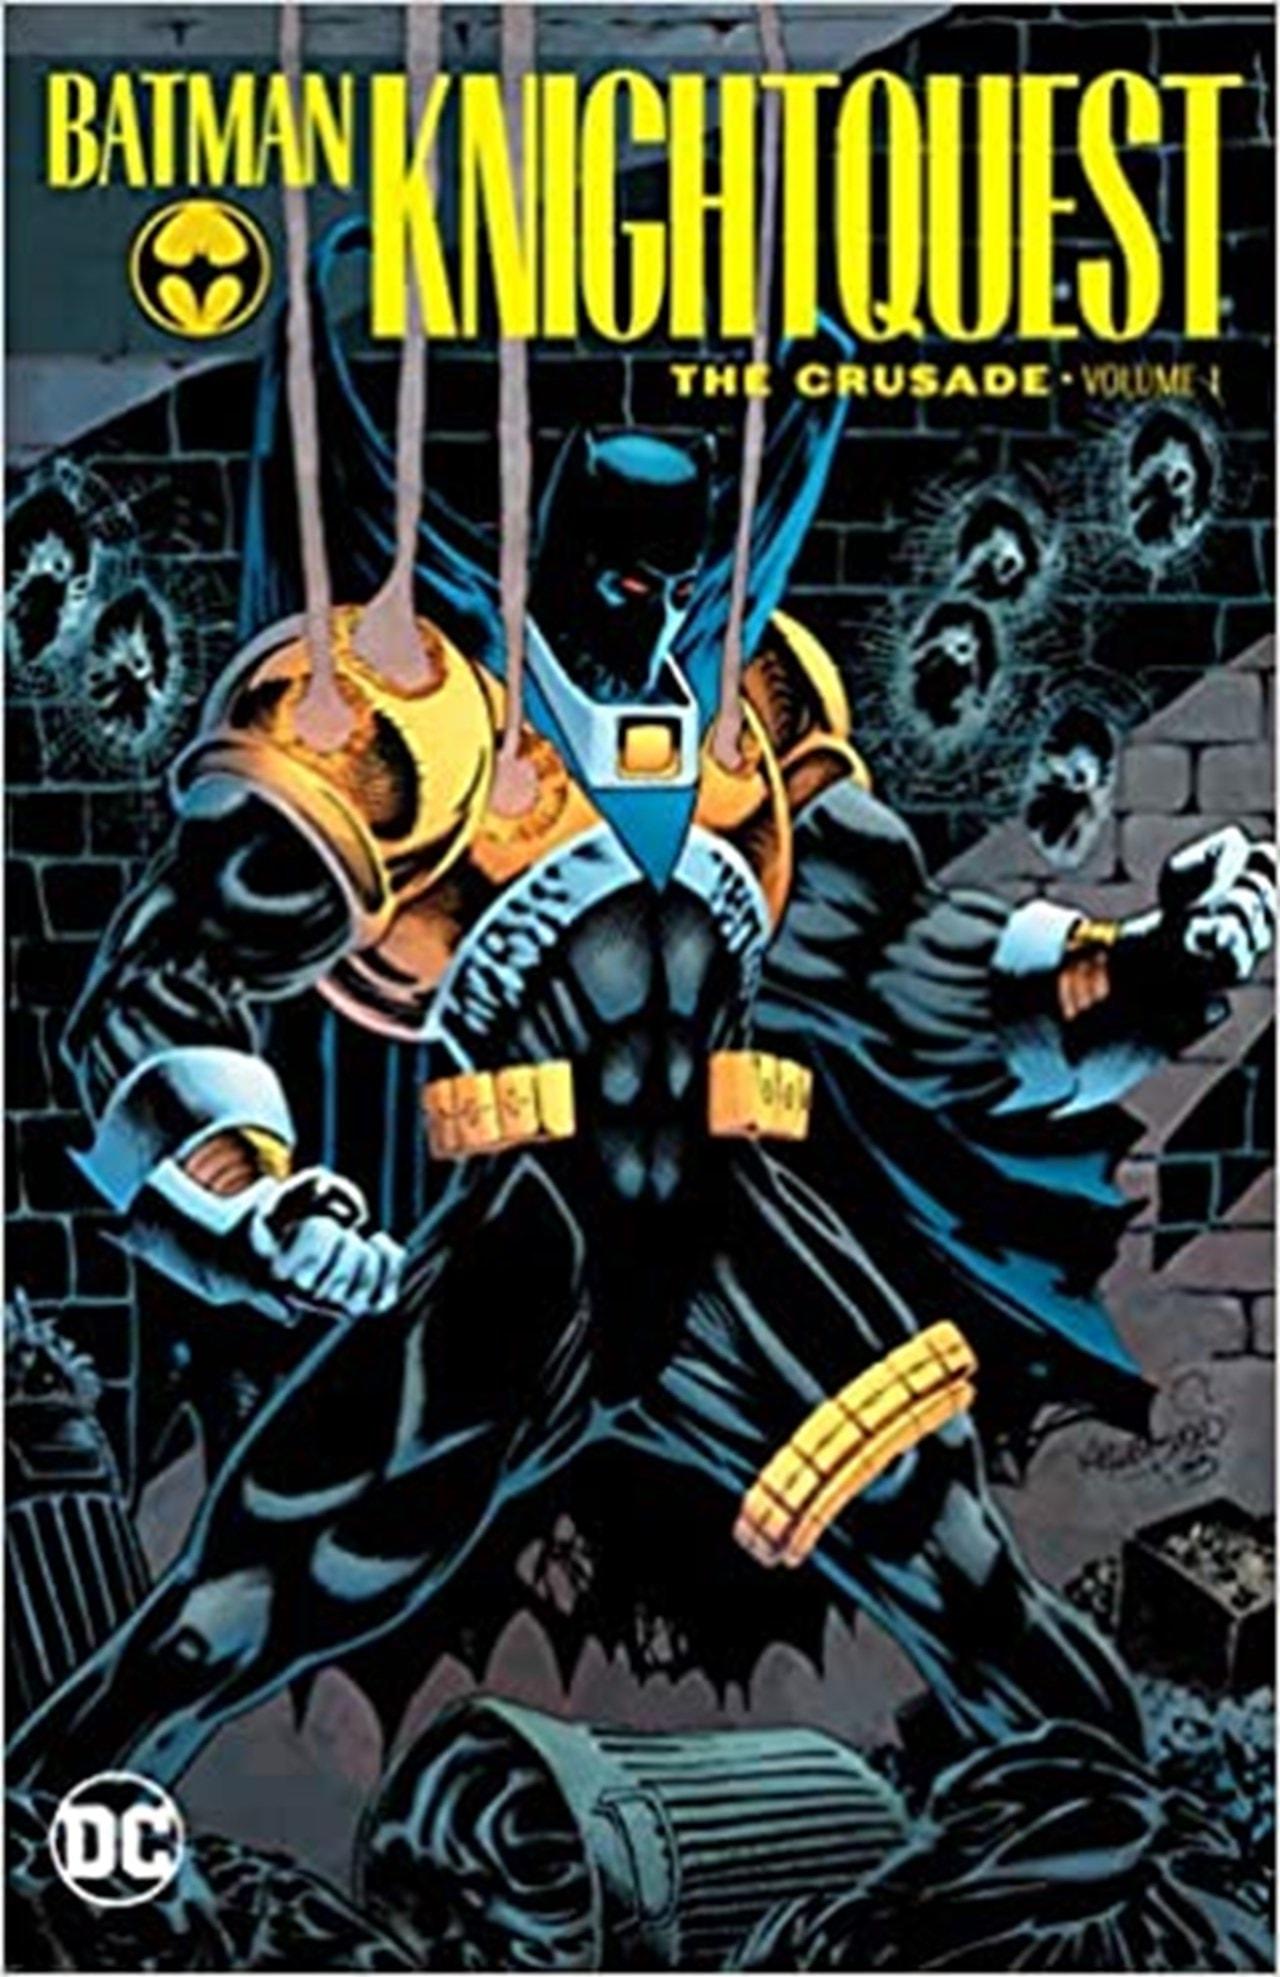 Batman Knightquest Volume 1: The Crusade - 1